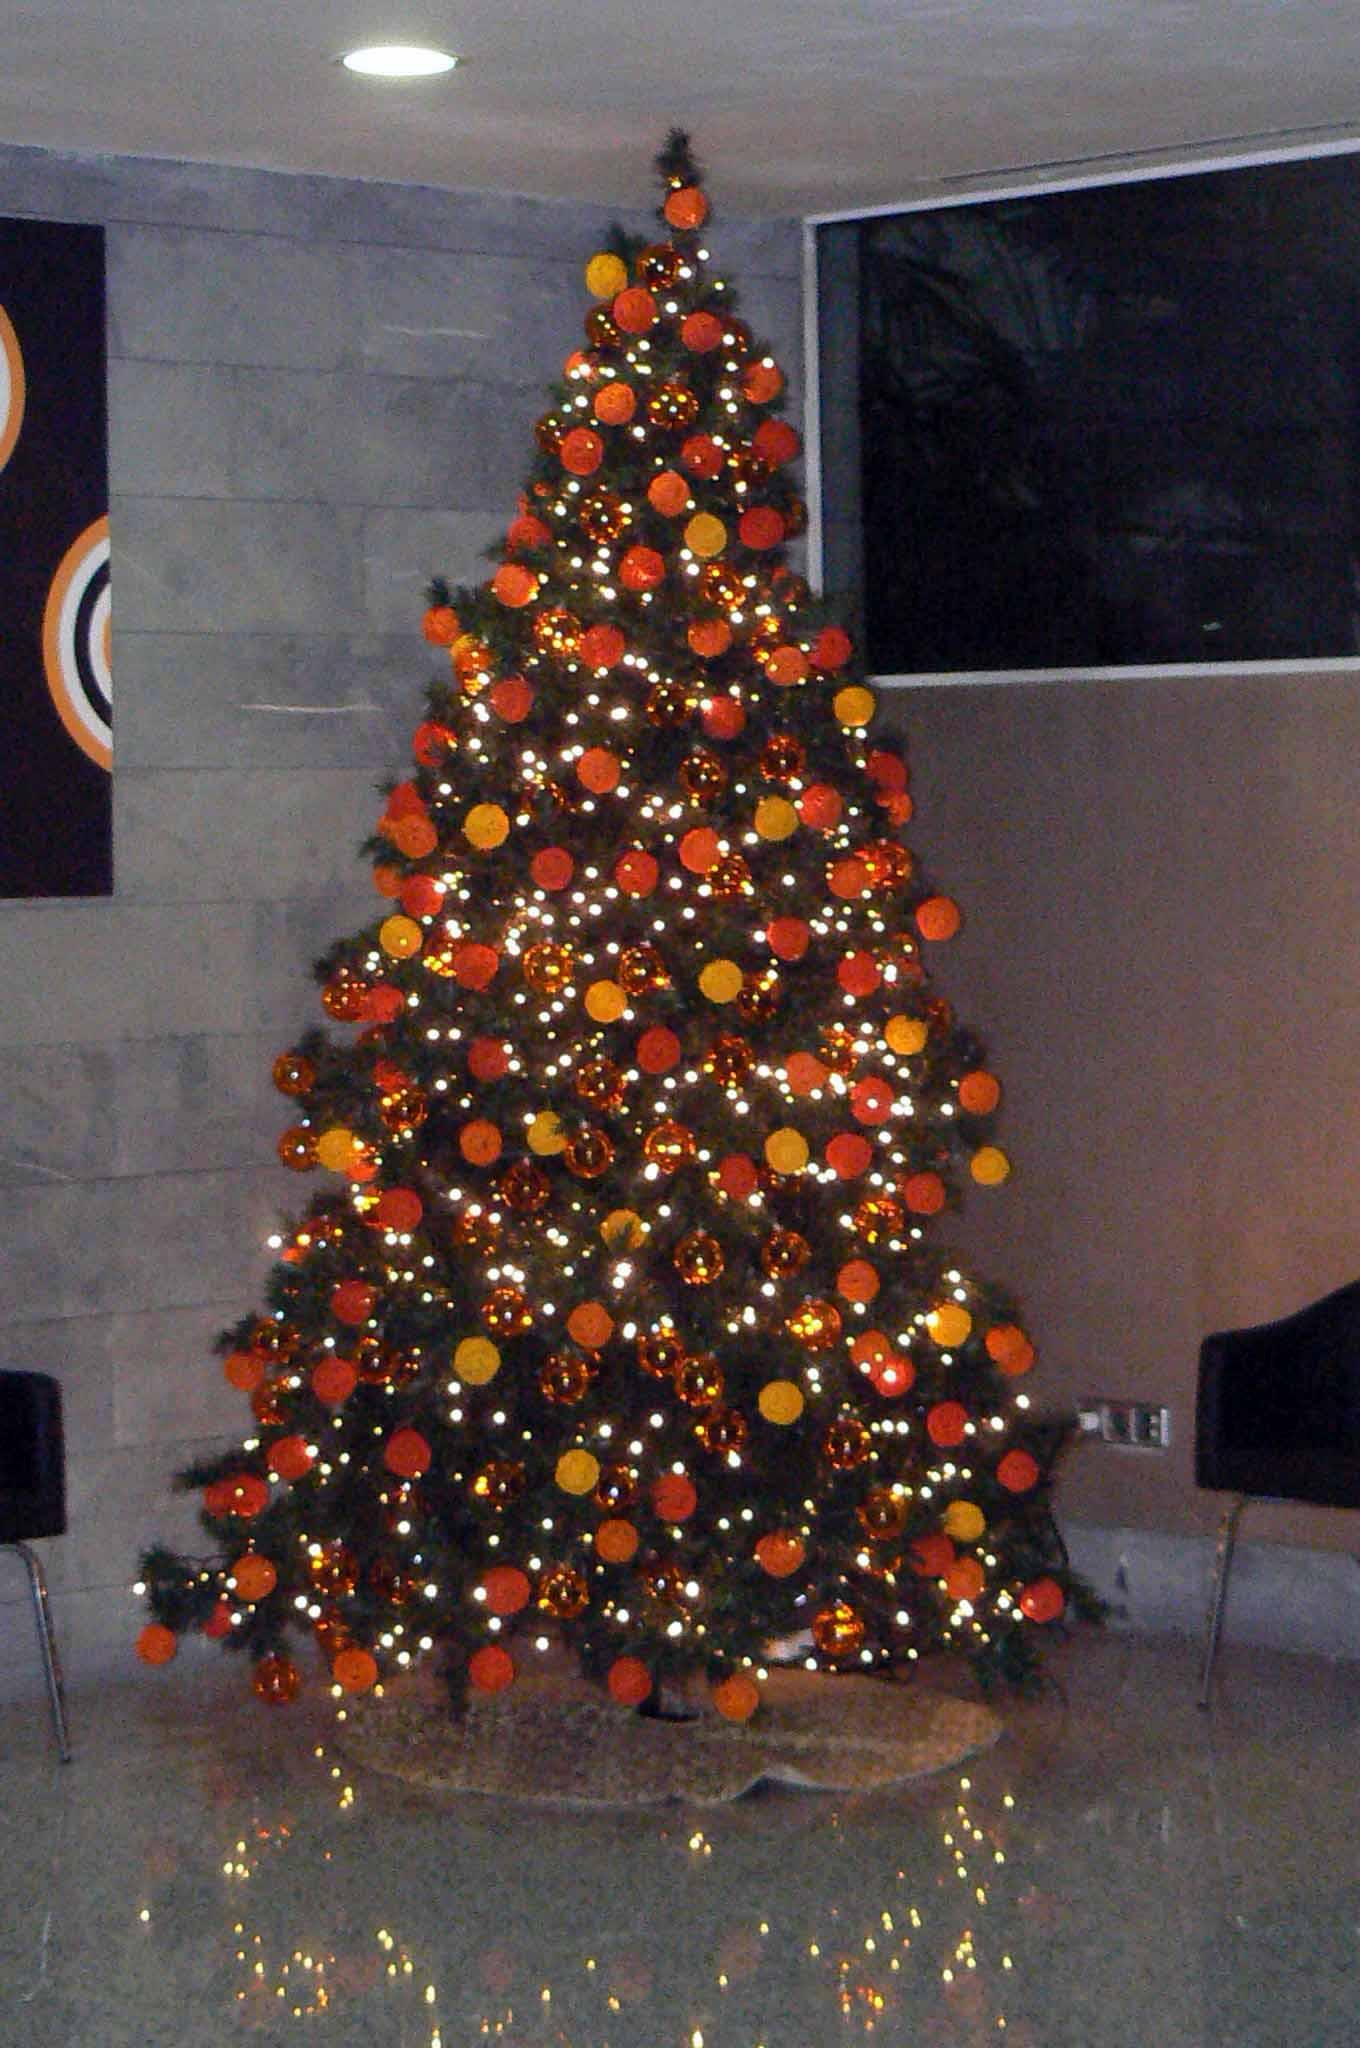 Rboles navidad color naranja b m rboles de navidad - Arbol de navidad colores ...